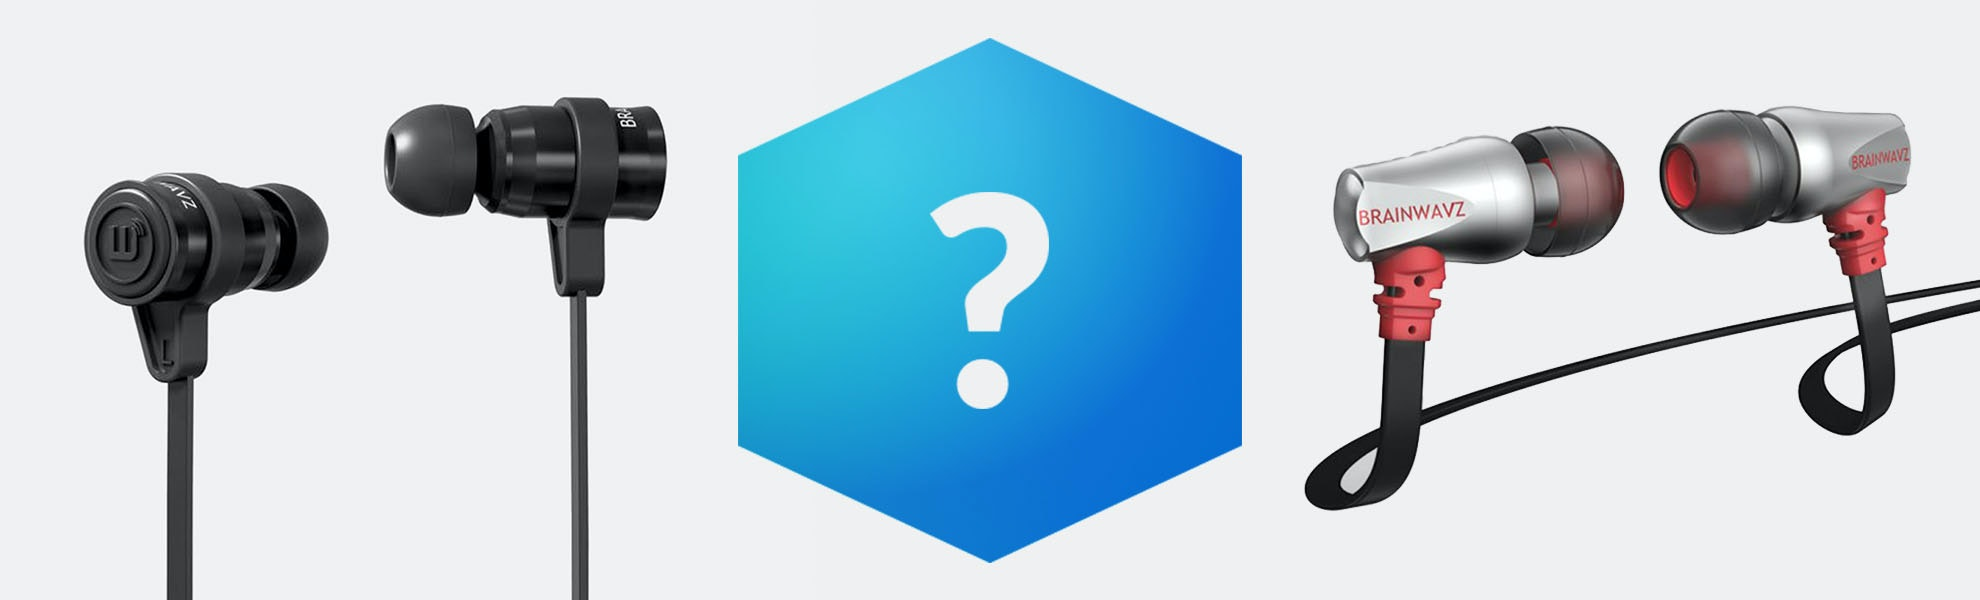 Massdrop Blue Box: Brainwavz IEMs